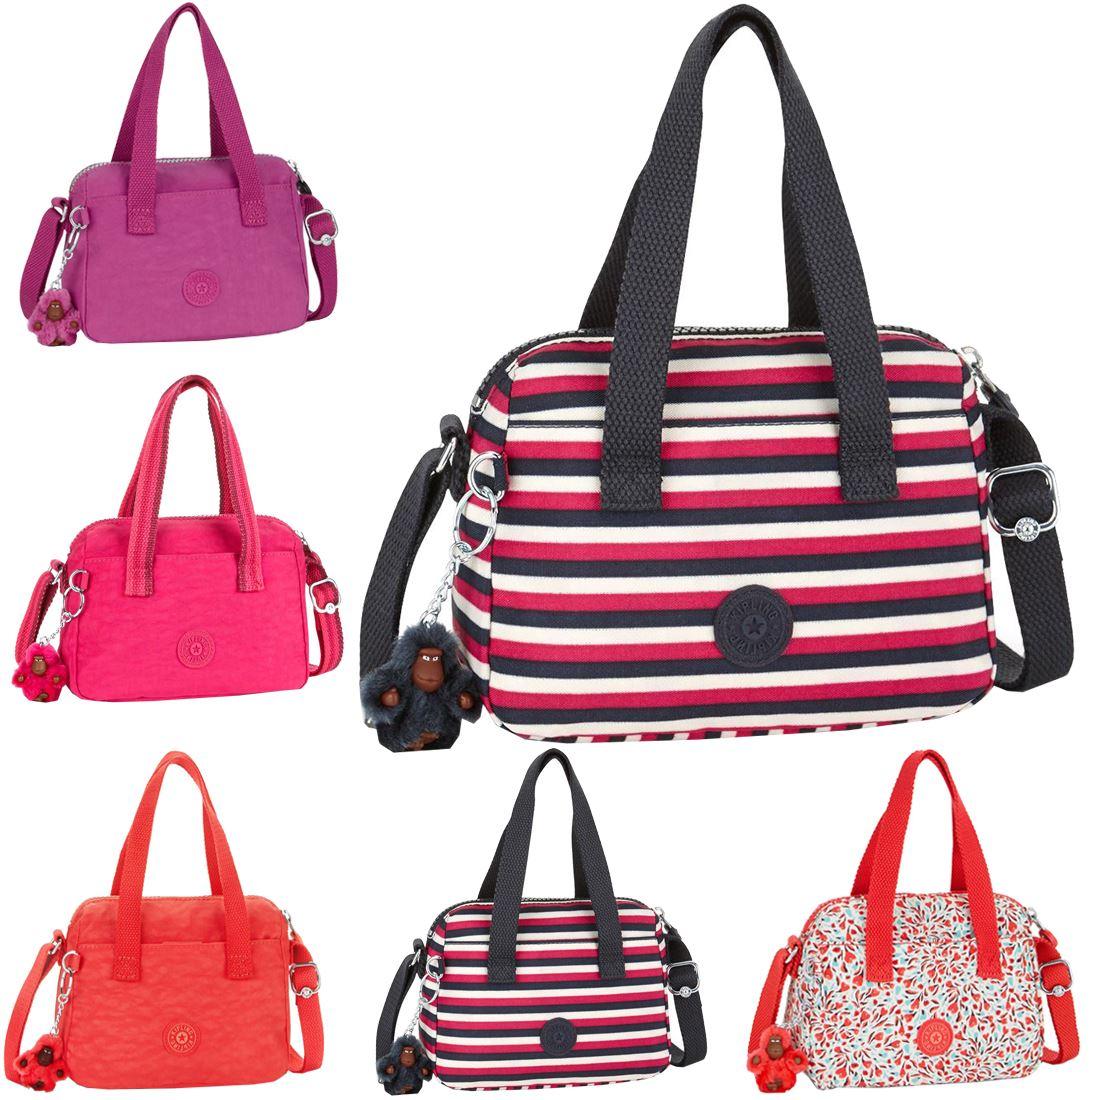 b48c3620d Details about Kipling Leike Small Fashion Womens Handbag Shoulder / Cross  Body Bag